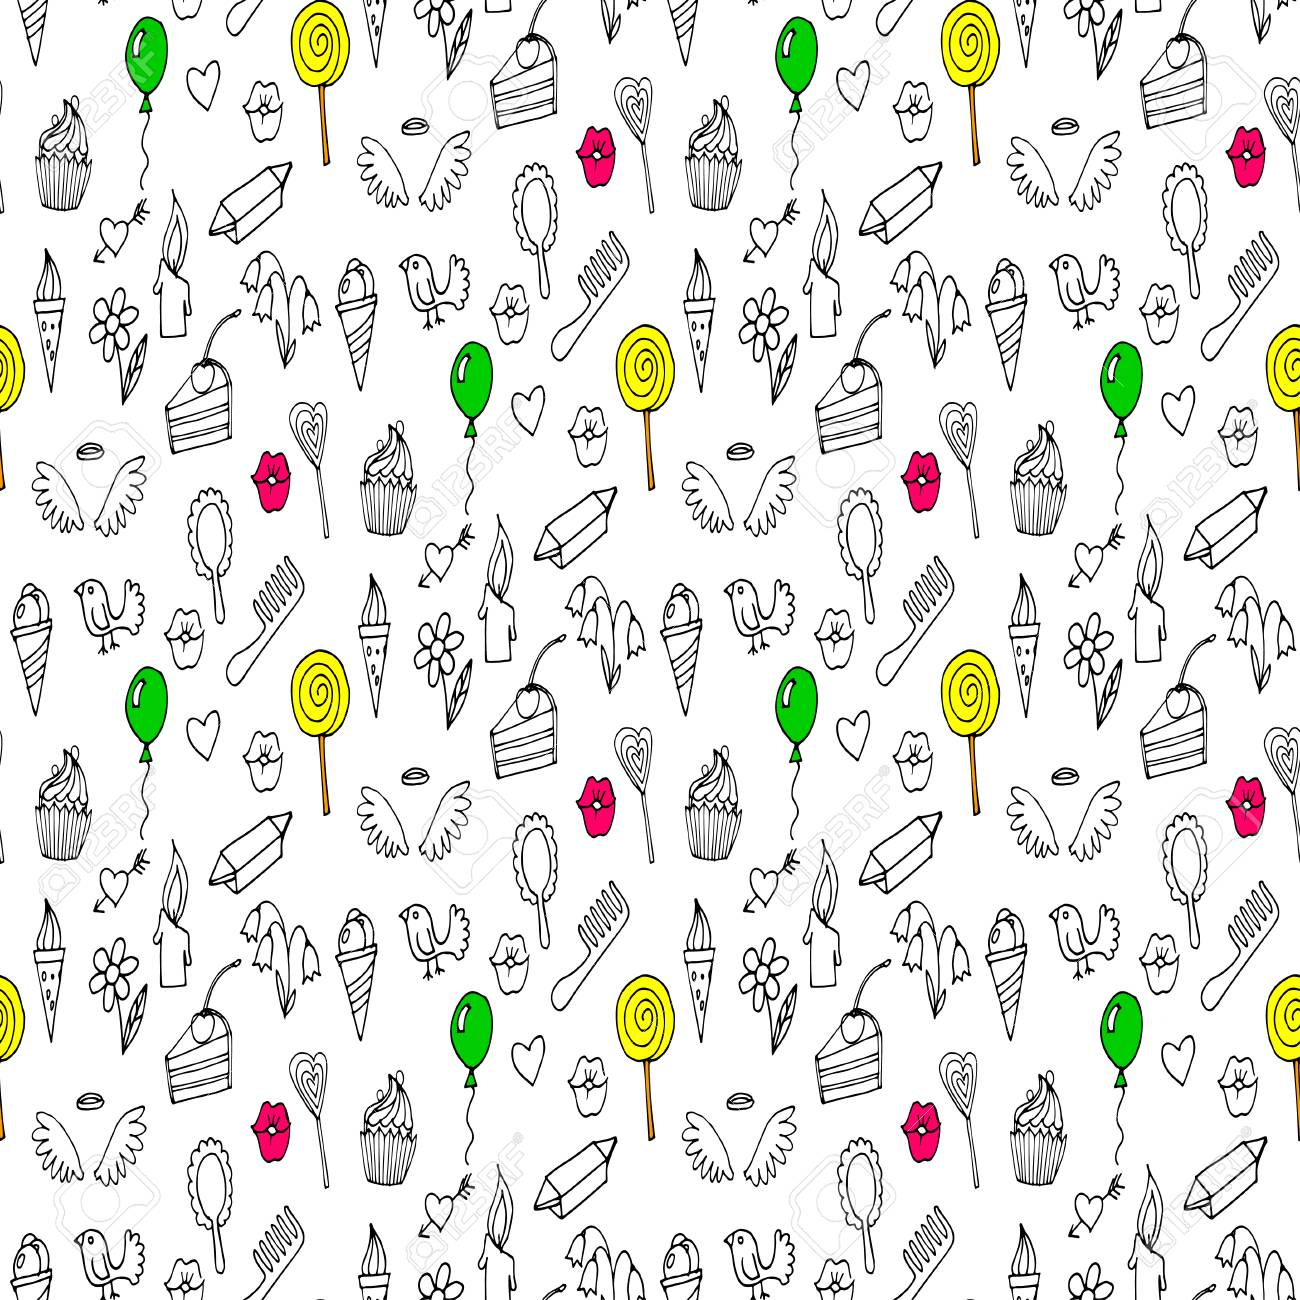 Doodles seamless pattern - 69017541